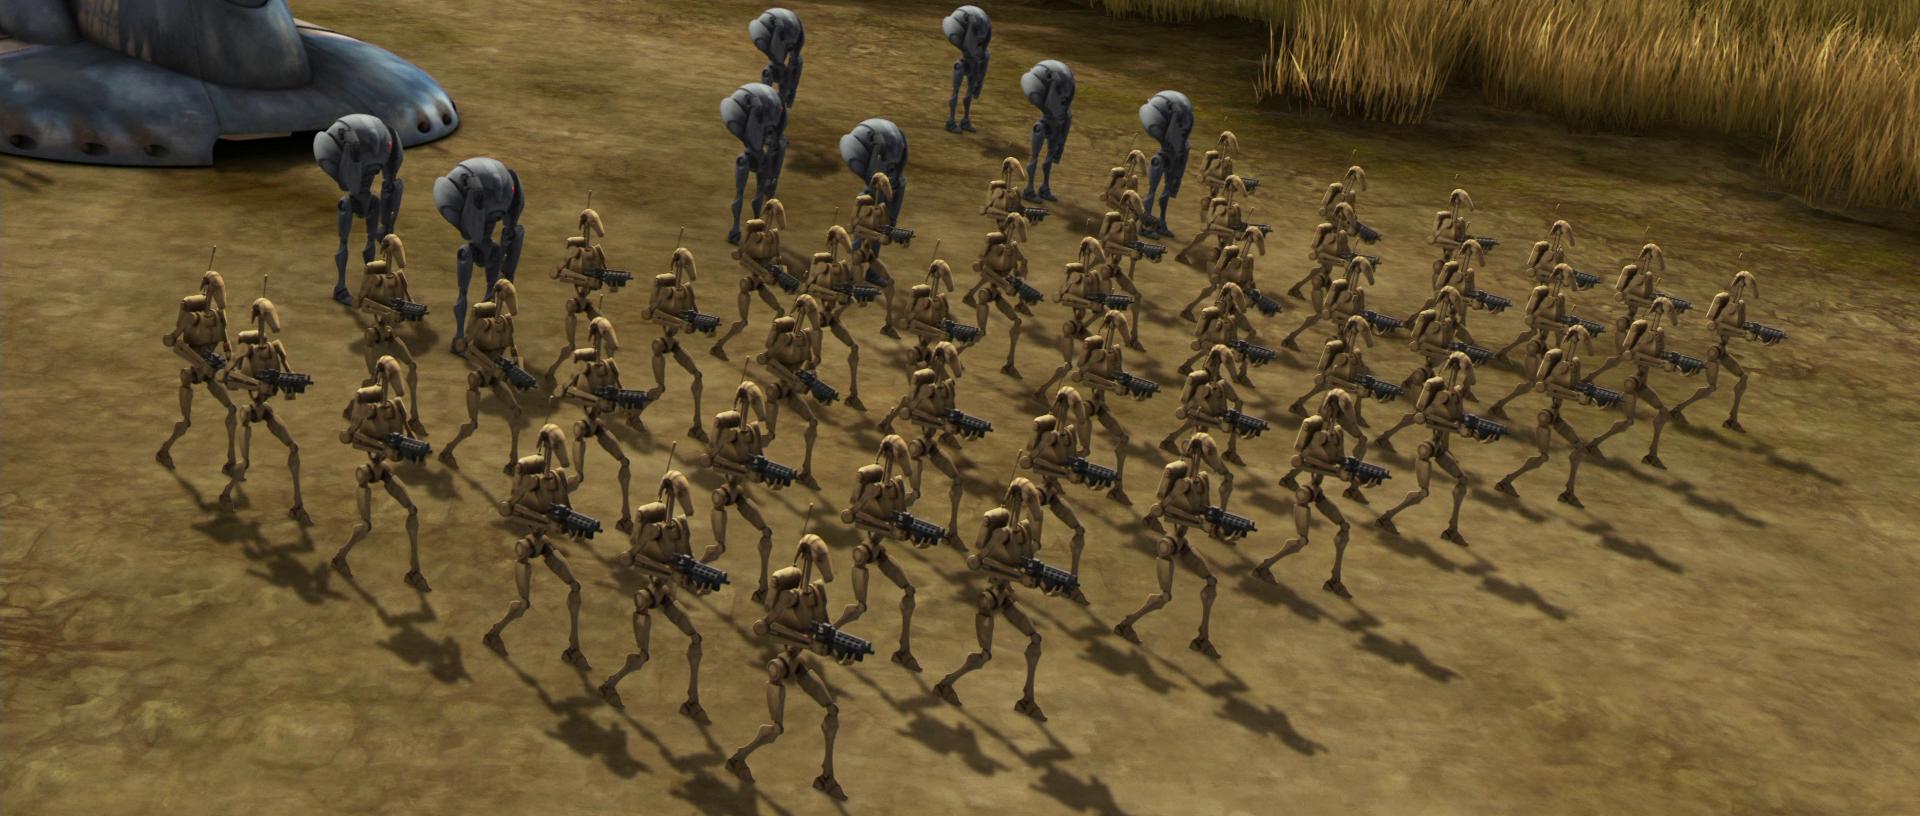 картинки армии дроидов изображения данном каталоге